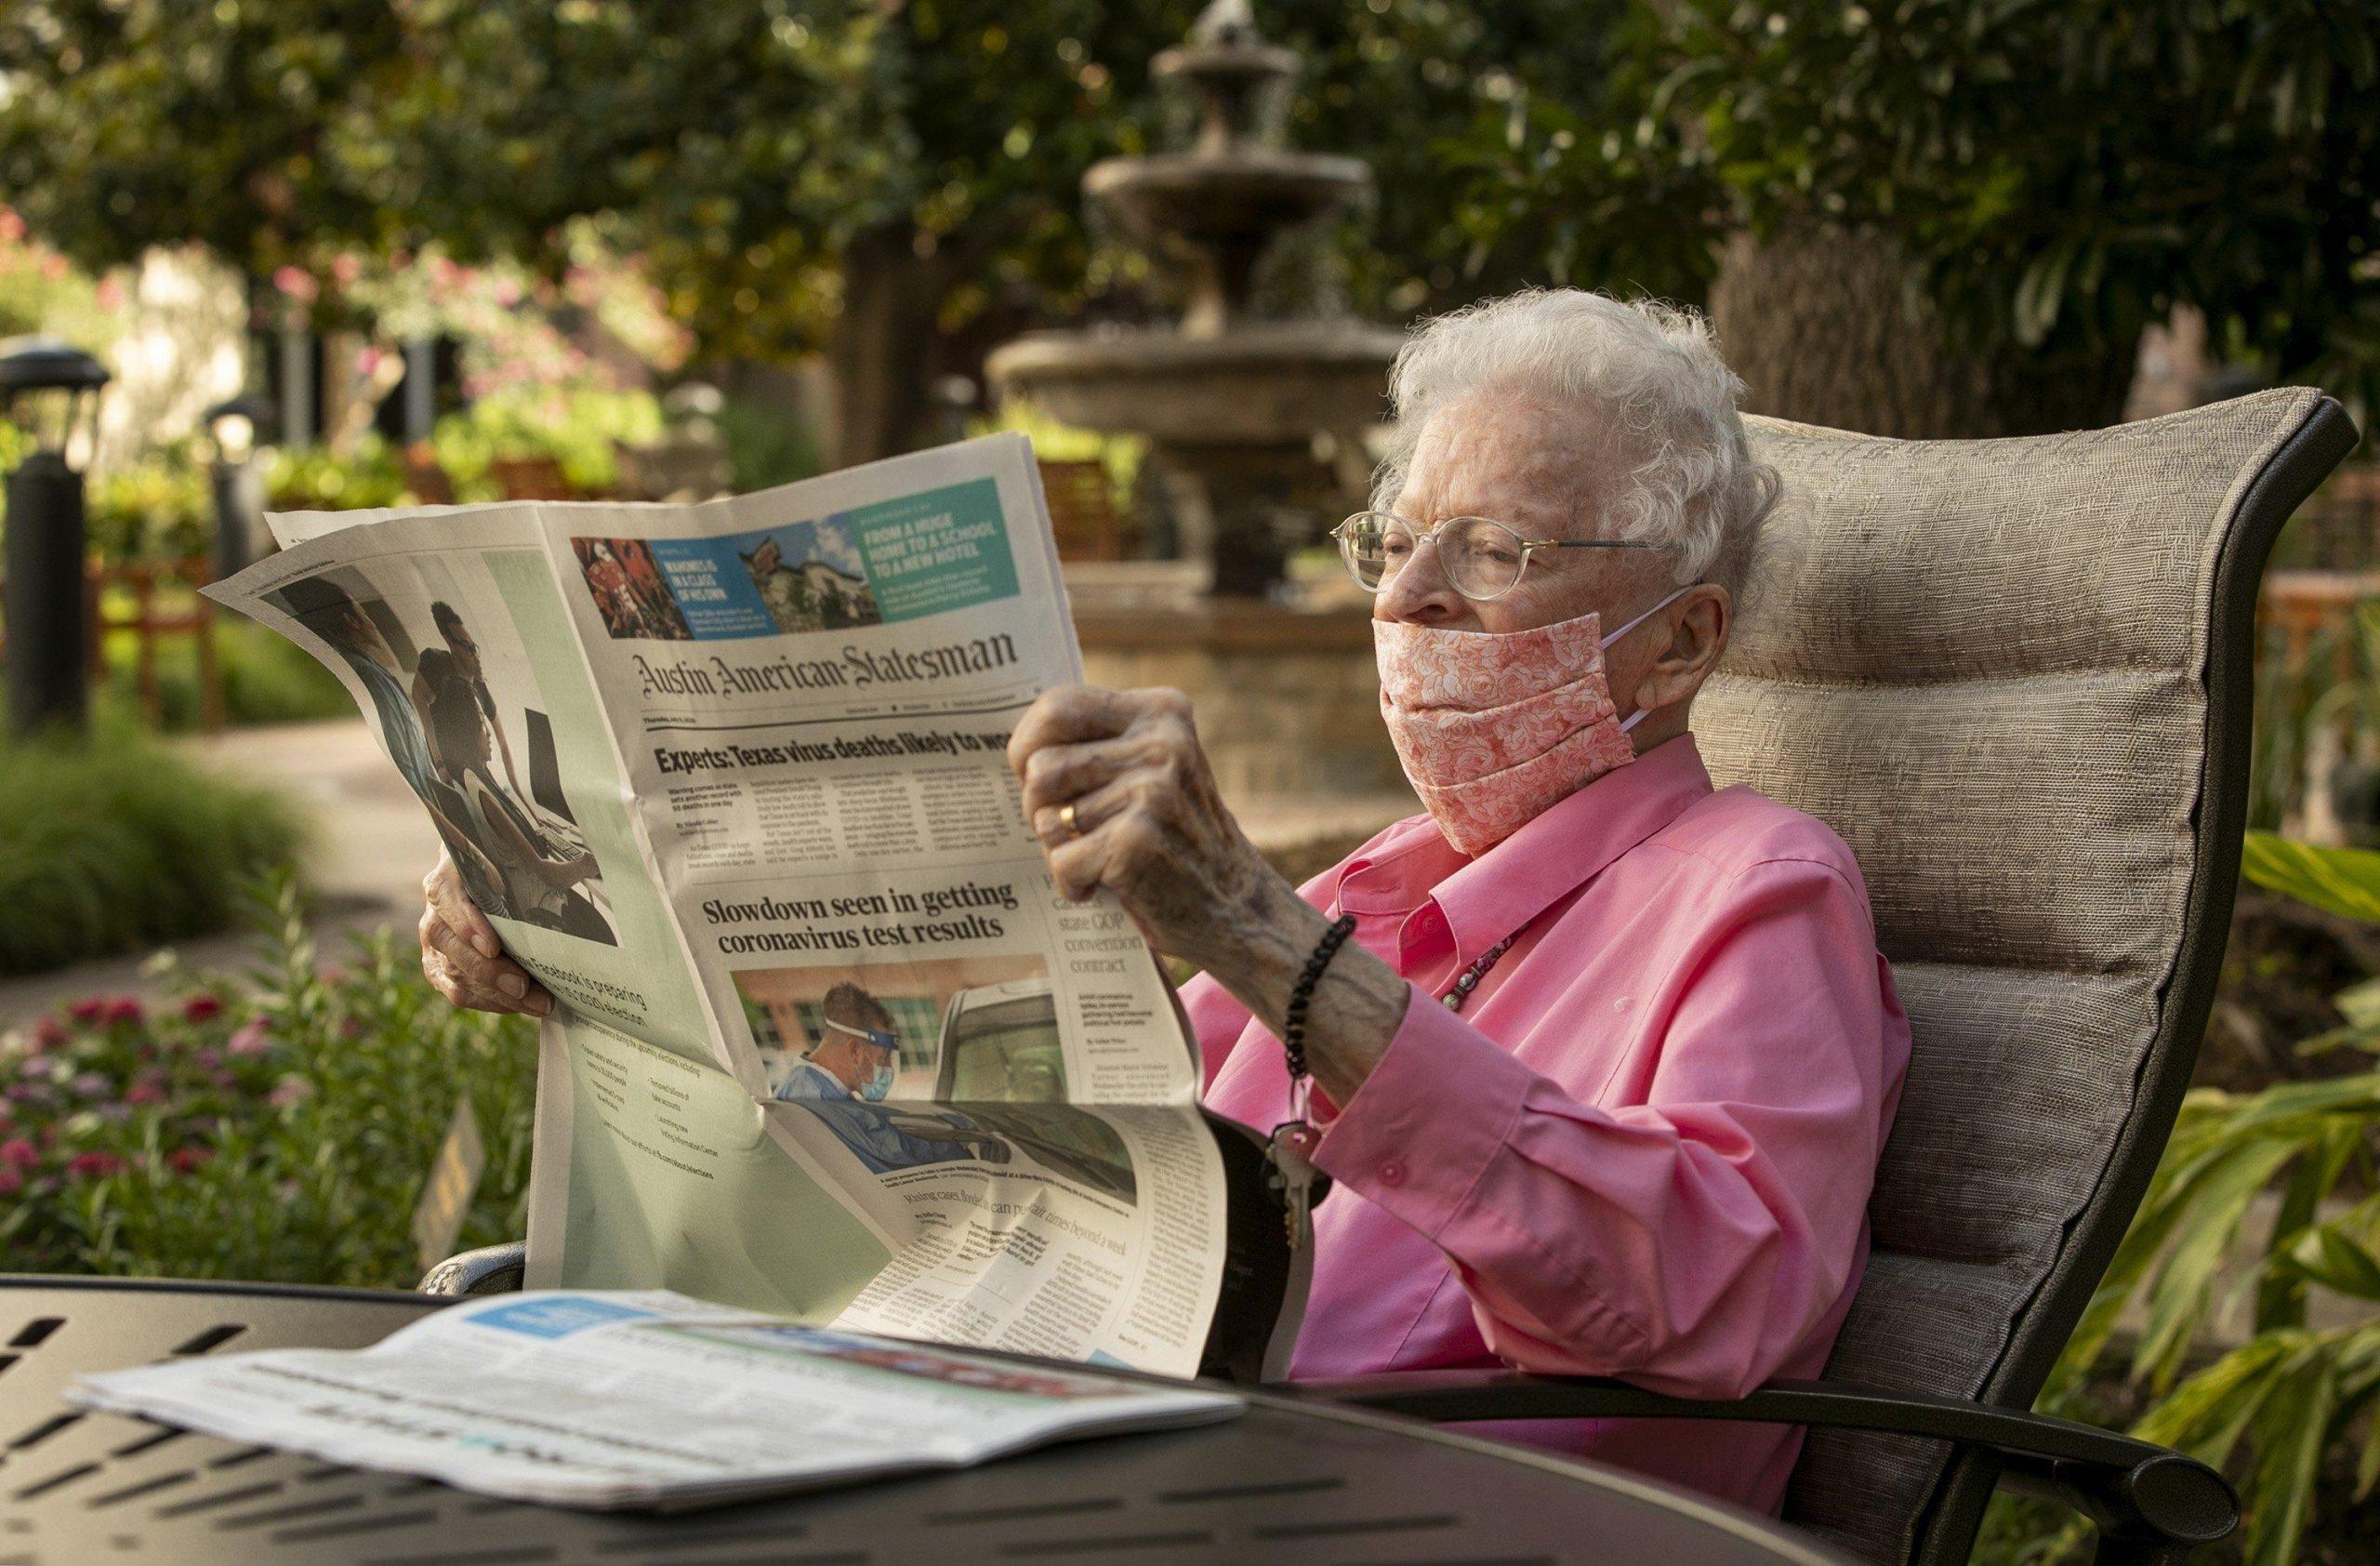 Meet the woman who's read the Austin American-Statesman since 1939 - Entertainment & Life - Brownwood Bulletin